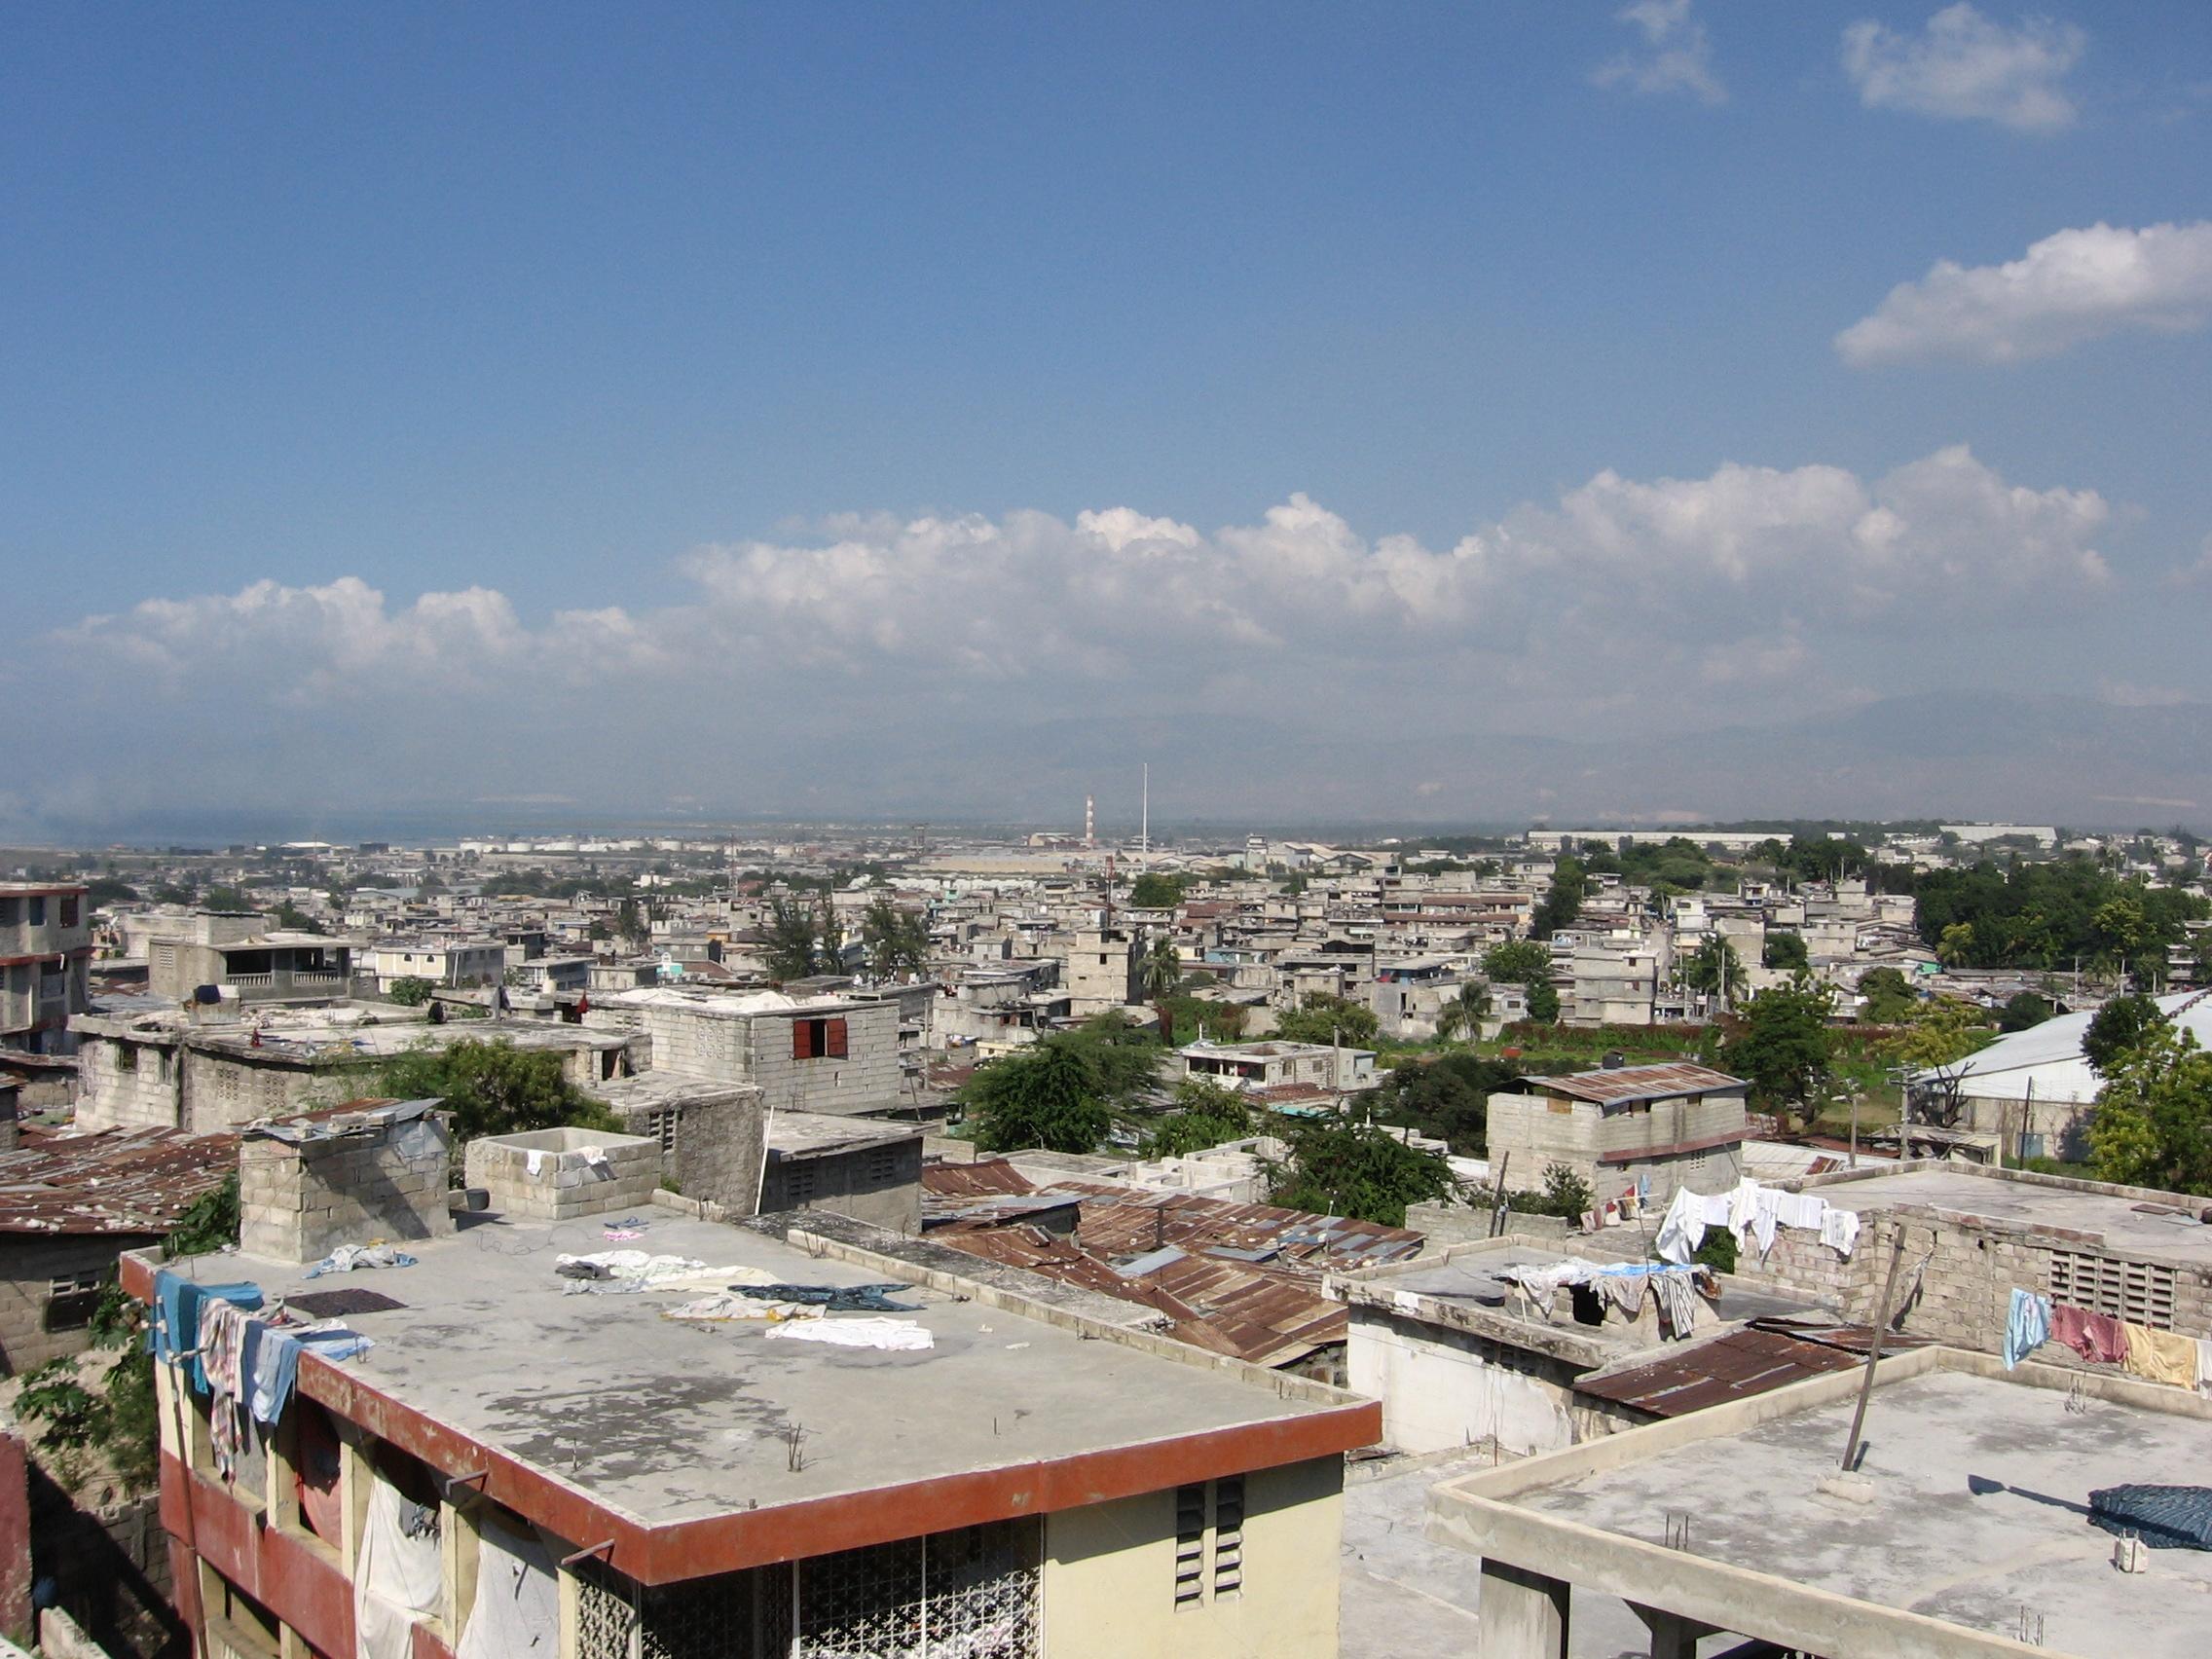 joey kelly photographs skyline in petionville haiti